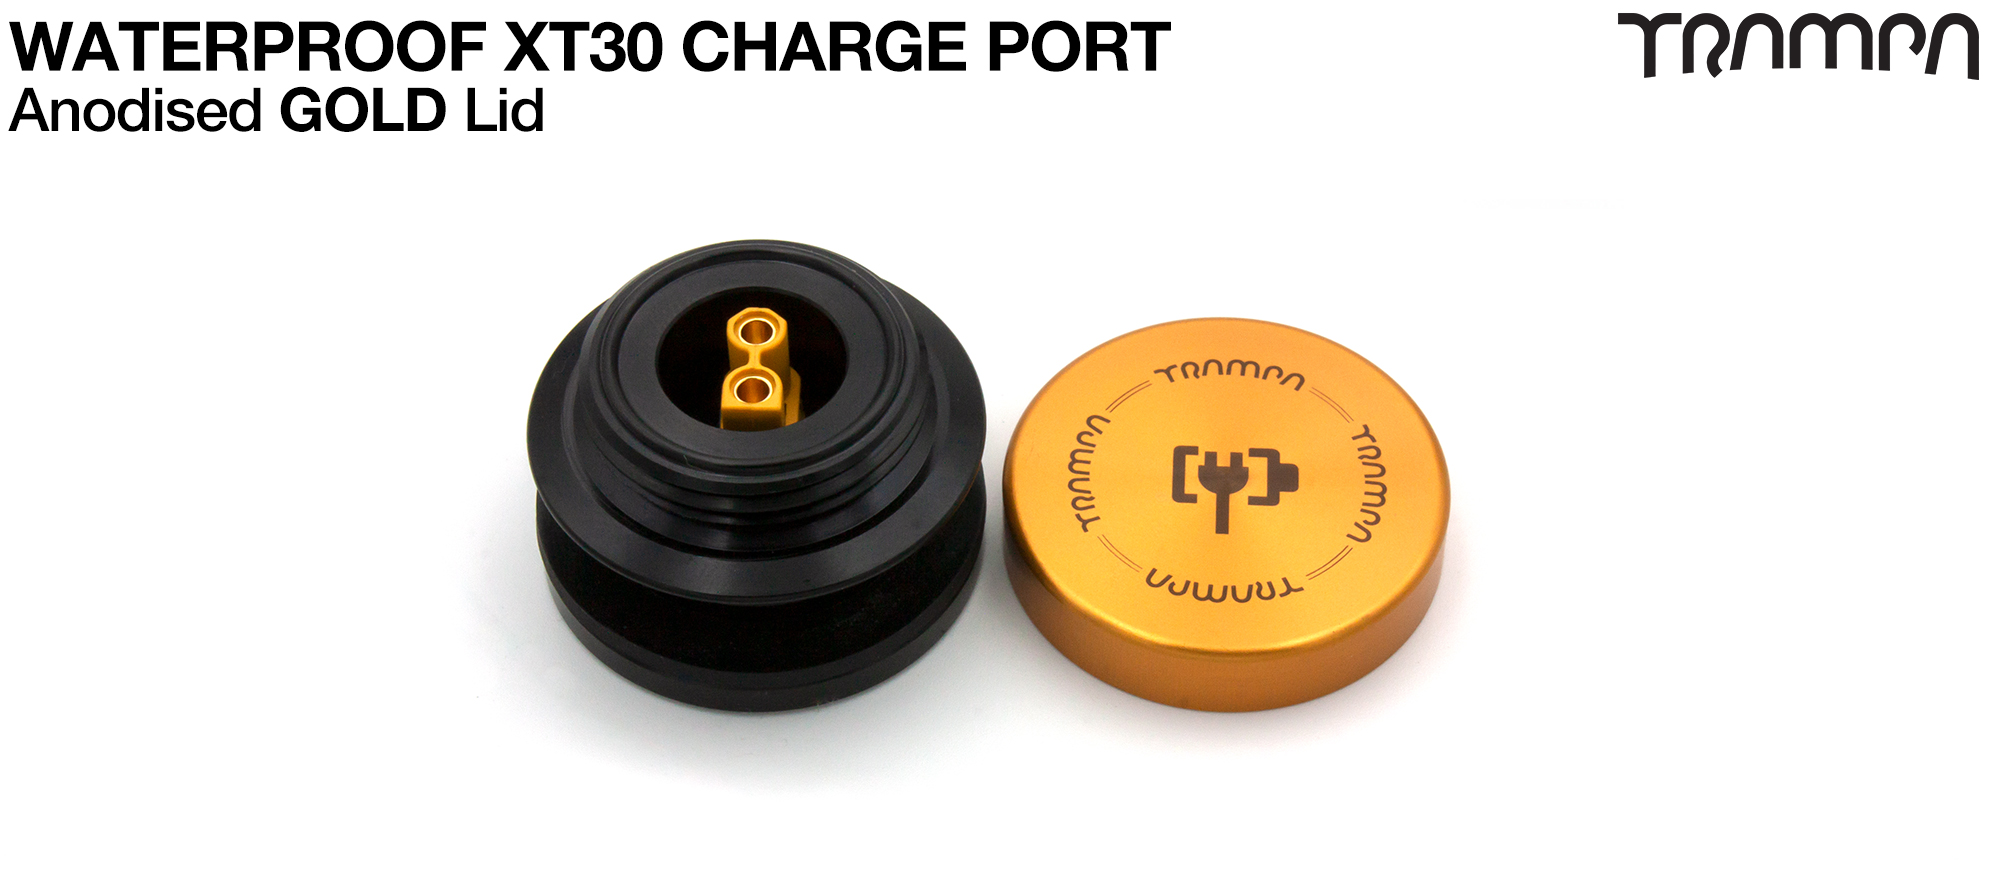 ORRSOM GT XT30 WATERPROOF Charge Port - GOLD